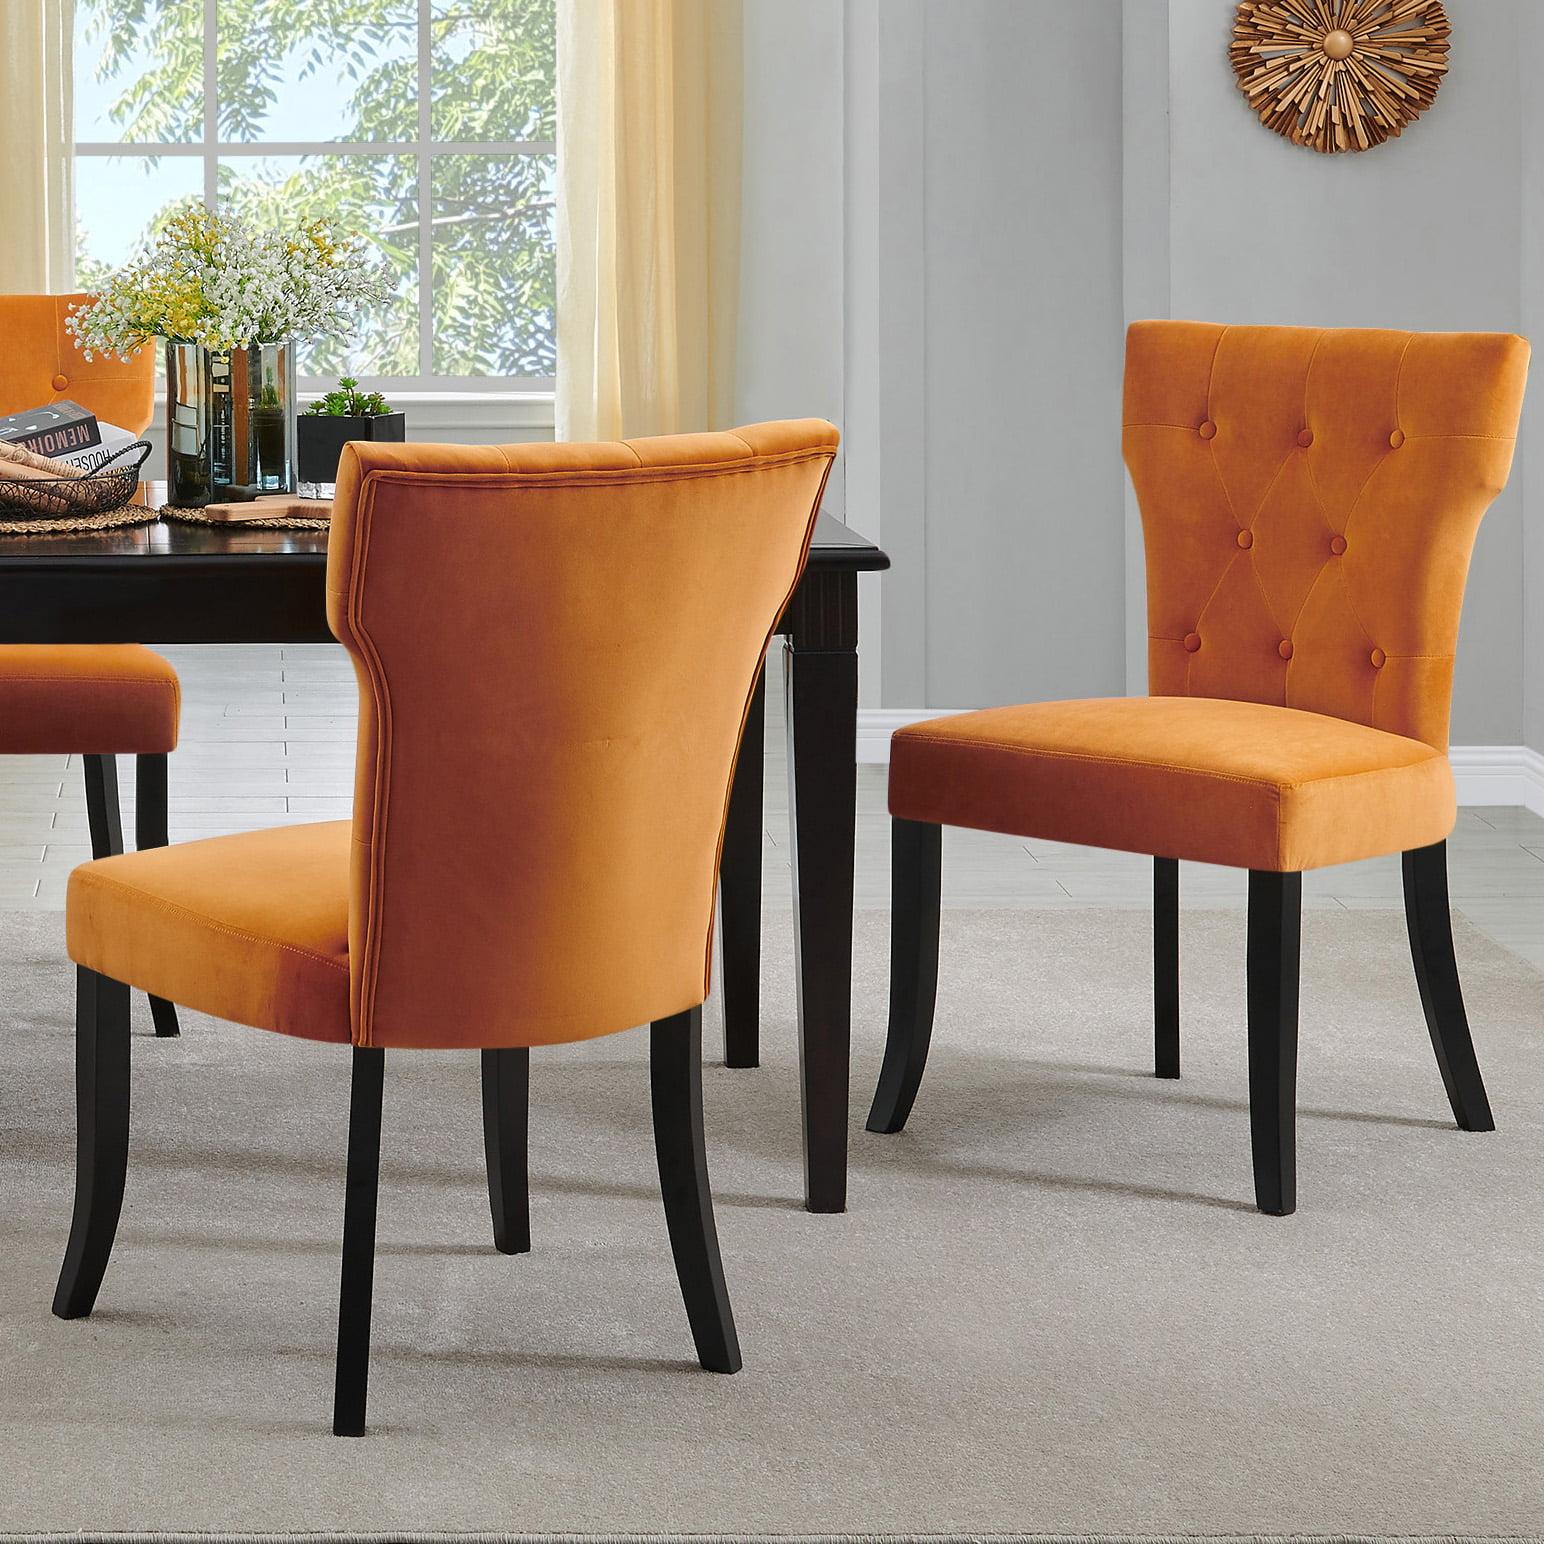 Homesvale Sabra Upholstered Dining Chairs In Mustard Gold Velvet Set Of 2 Walmart Com Walmart Com